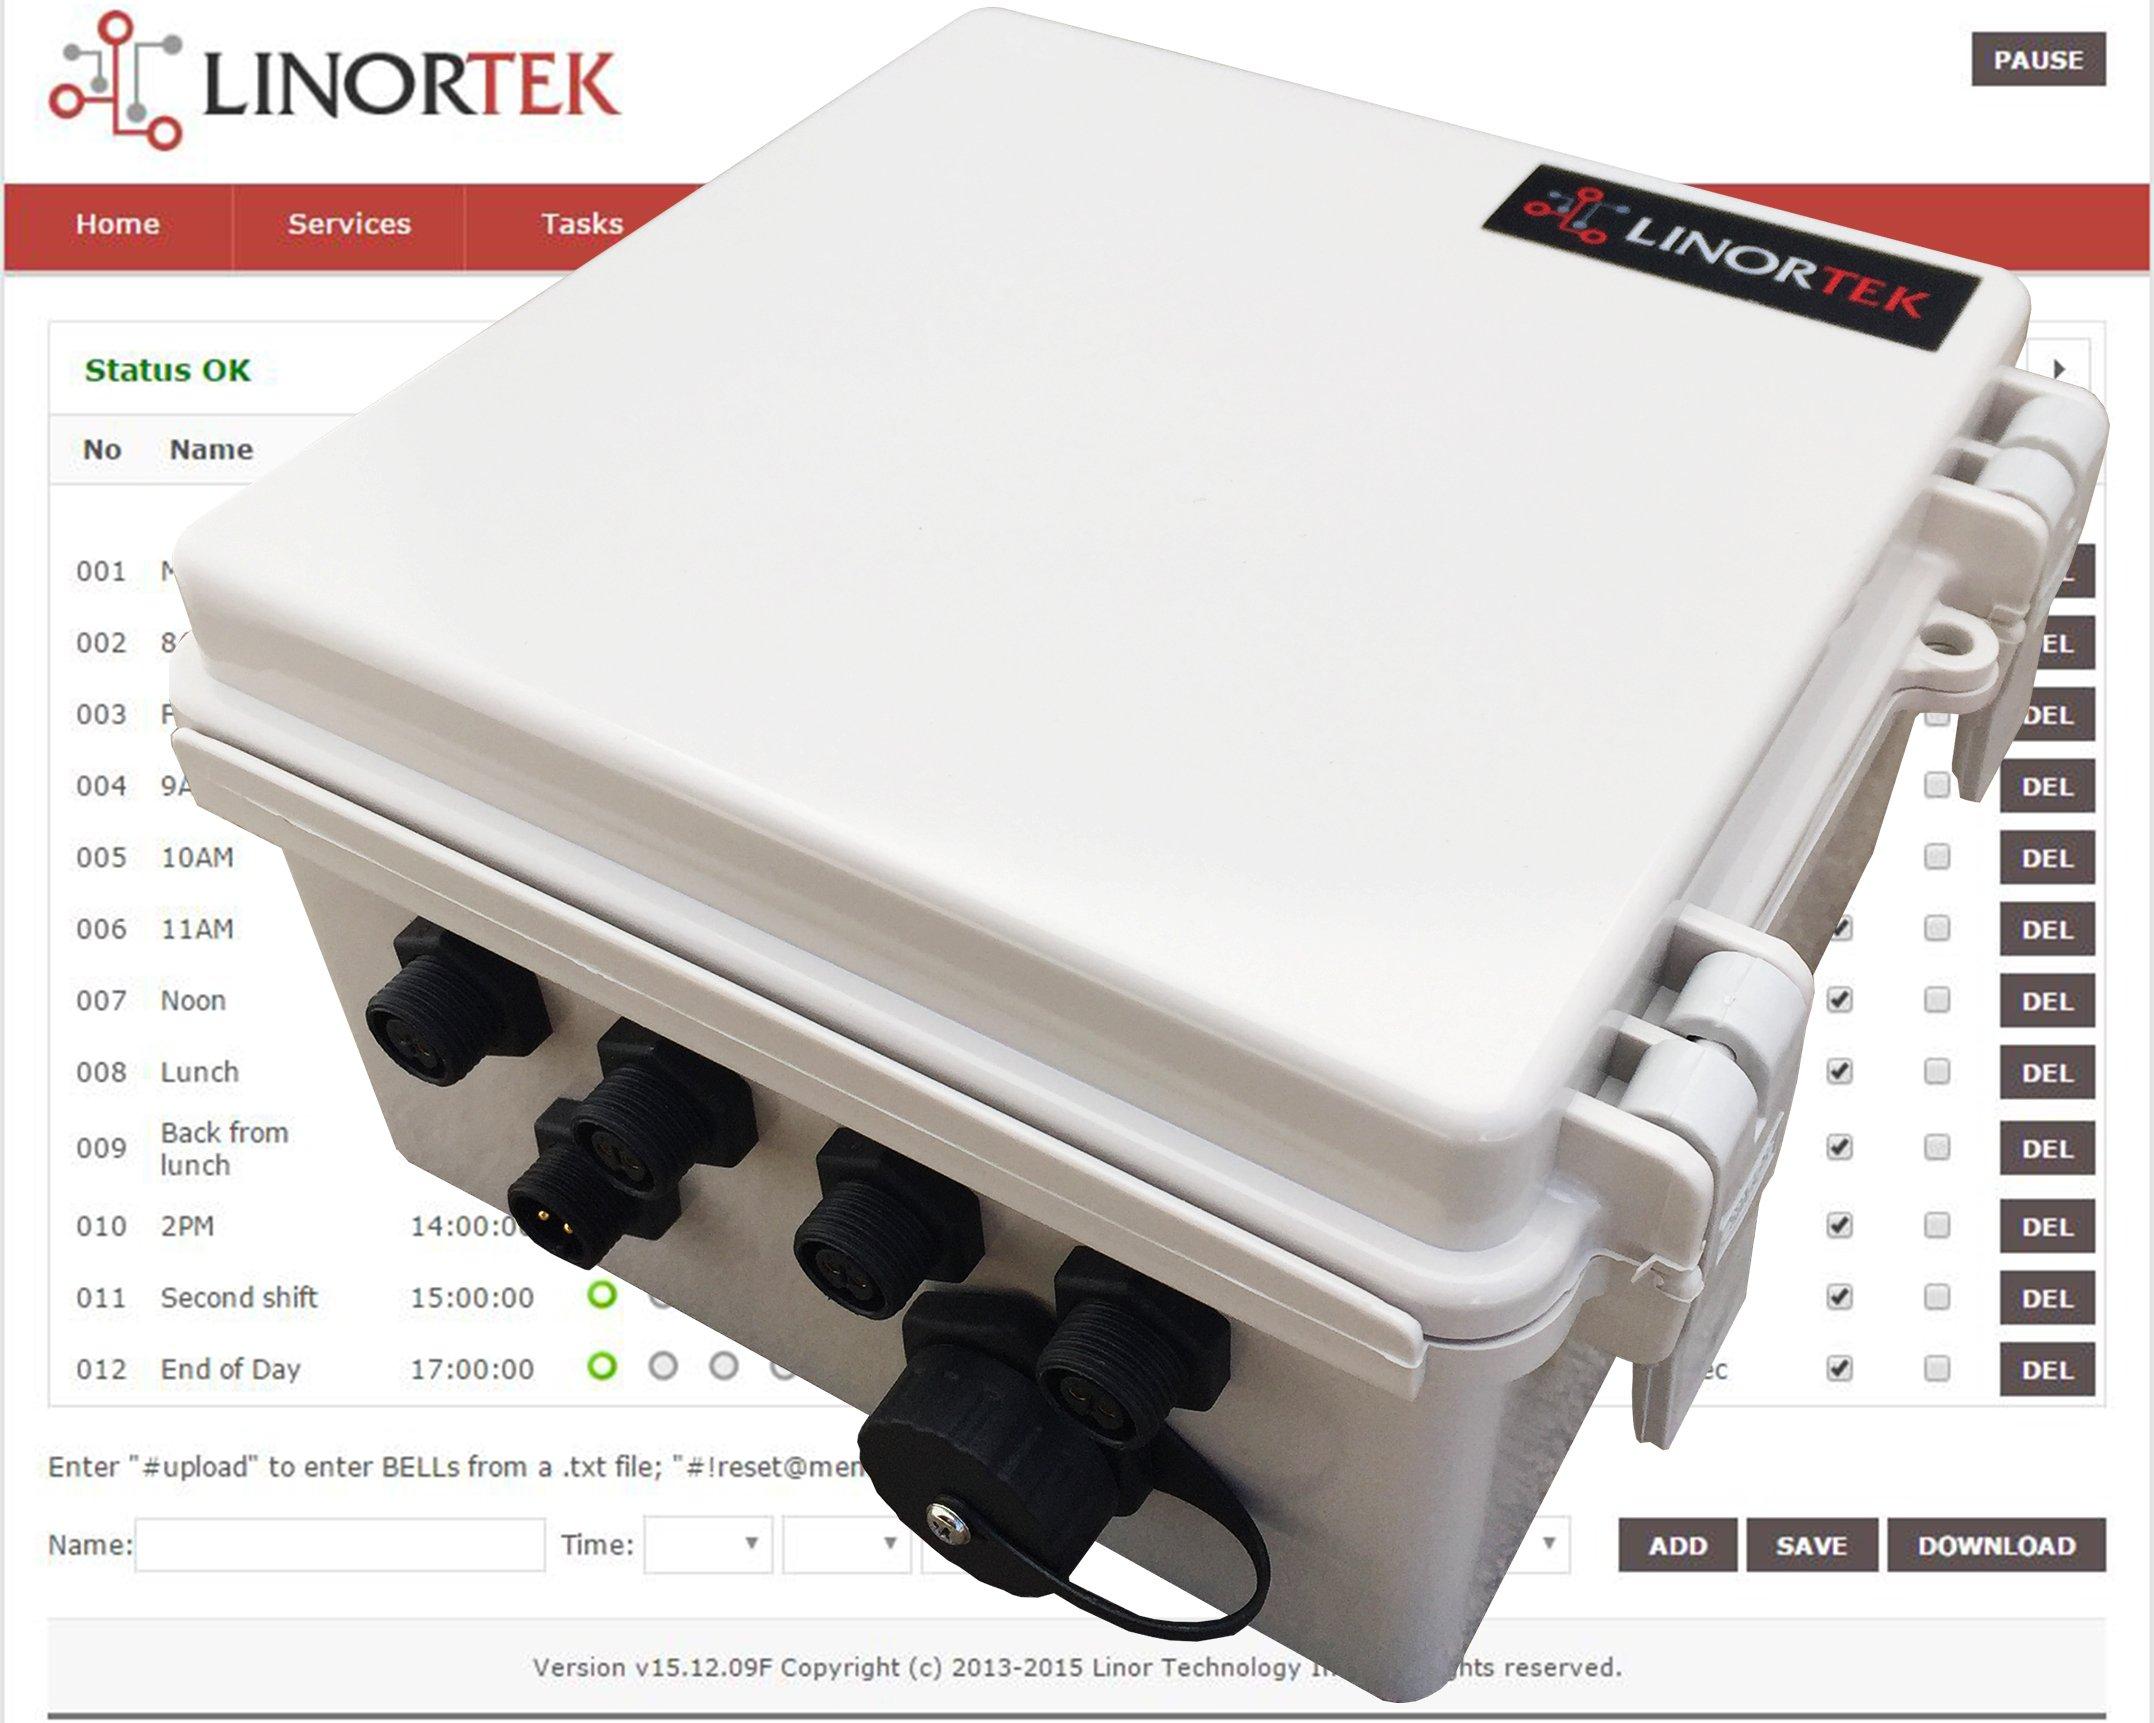 Linortek Netbell-4 TCP/IP Ethernet 4 Zone Bell Ringer Web-based Bell Controller for Alarm Signal Bell/Horn/Buzzer and Other Timed Equipment POE by Linortek (Image #2)